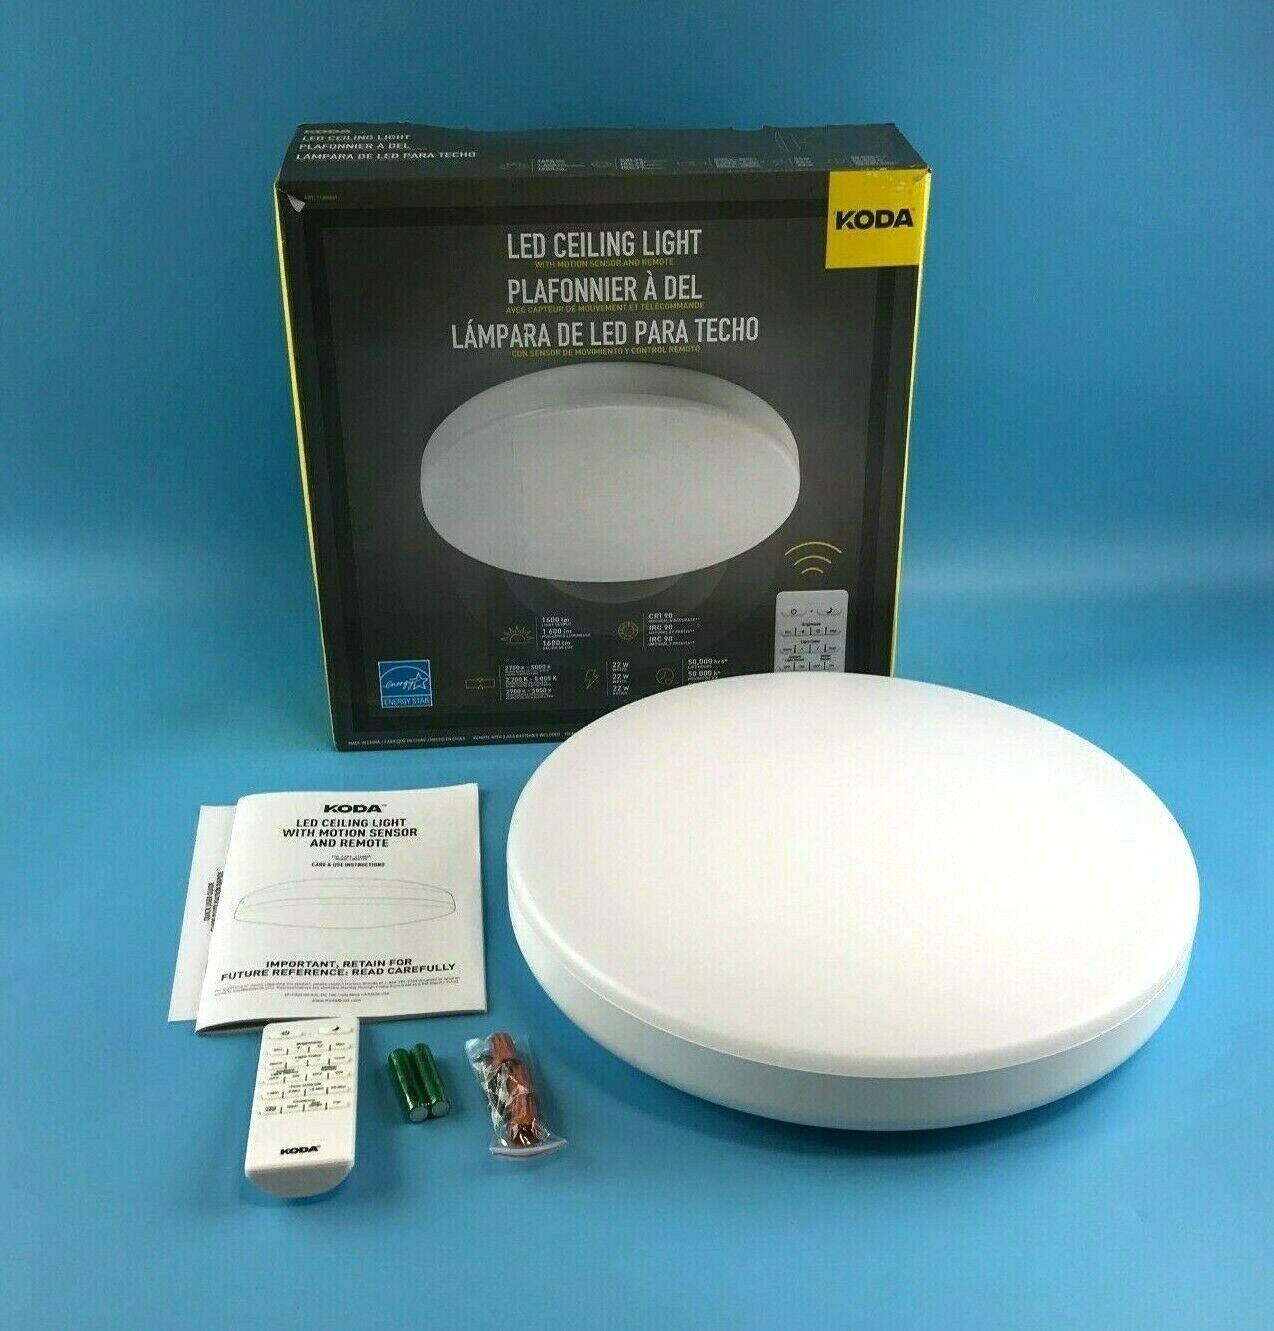 KODA LED Ceiling Light 1165831 w/ Motion Activated Sensor ...